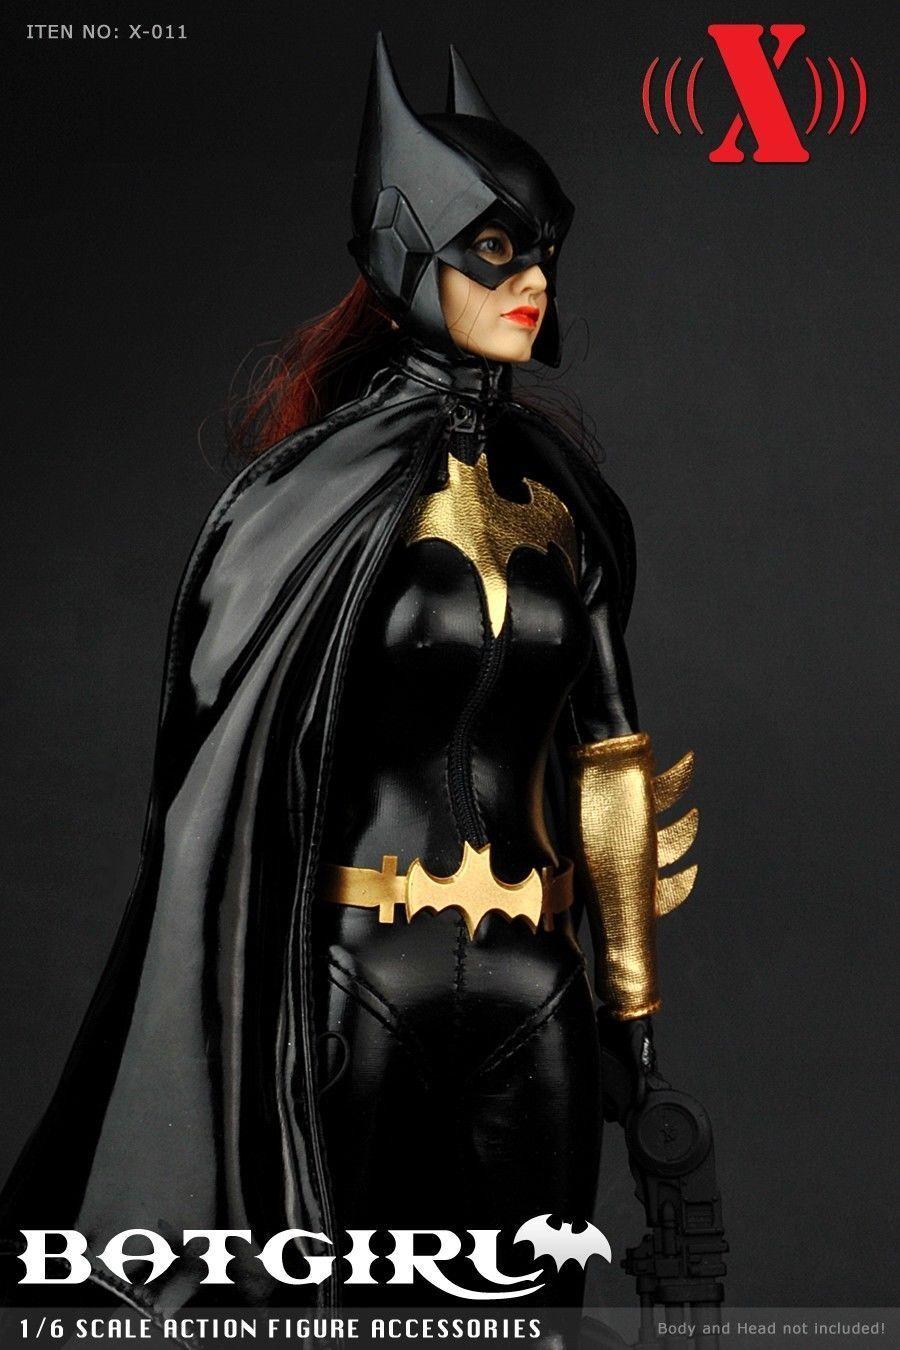 BATGIRL Suit Set X-011 1 6 Female Clothes Fit 12  Woman Figure No Body No Head